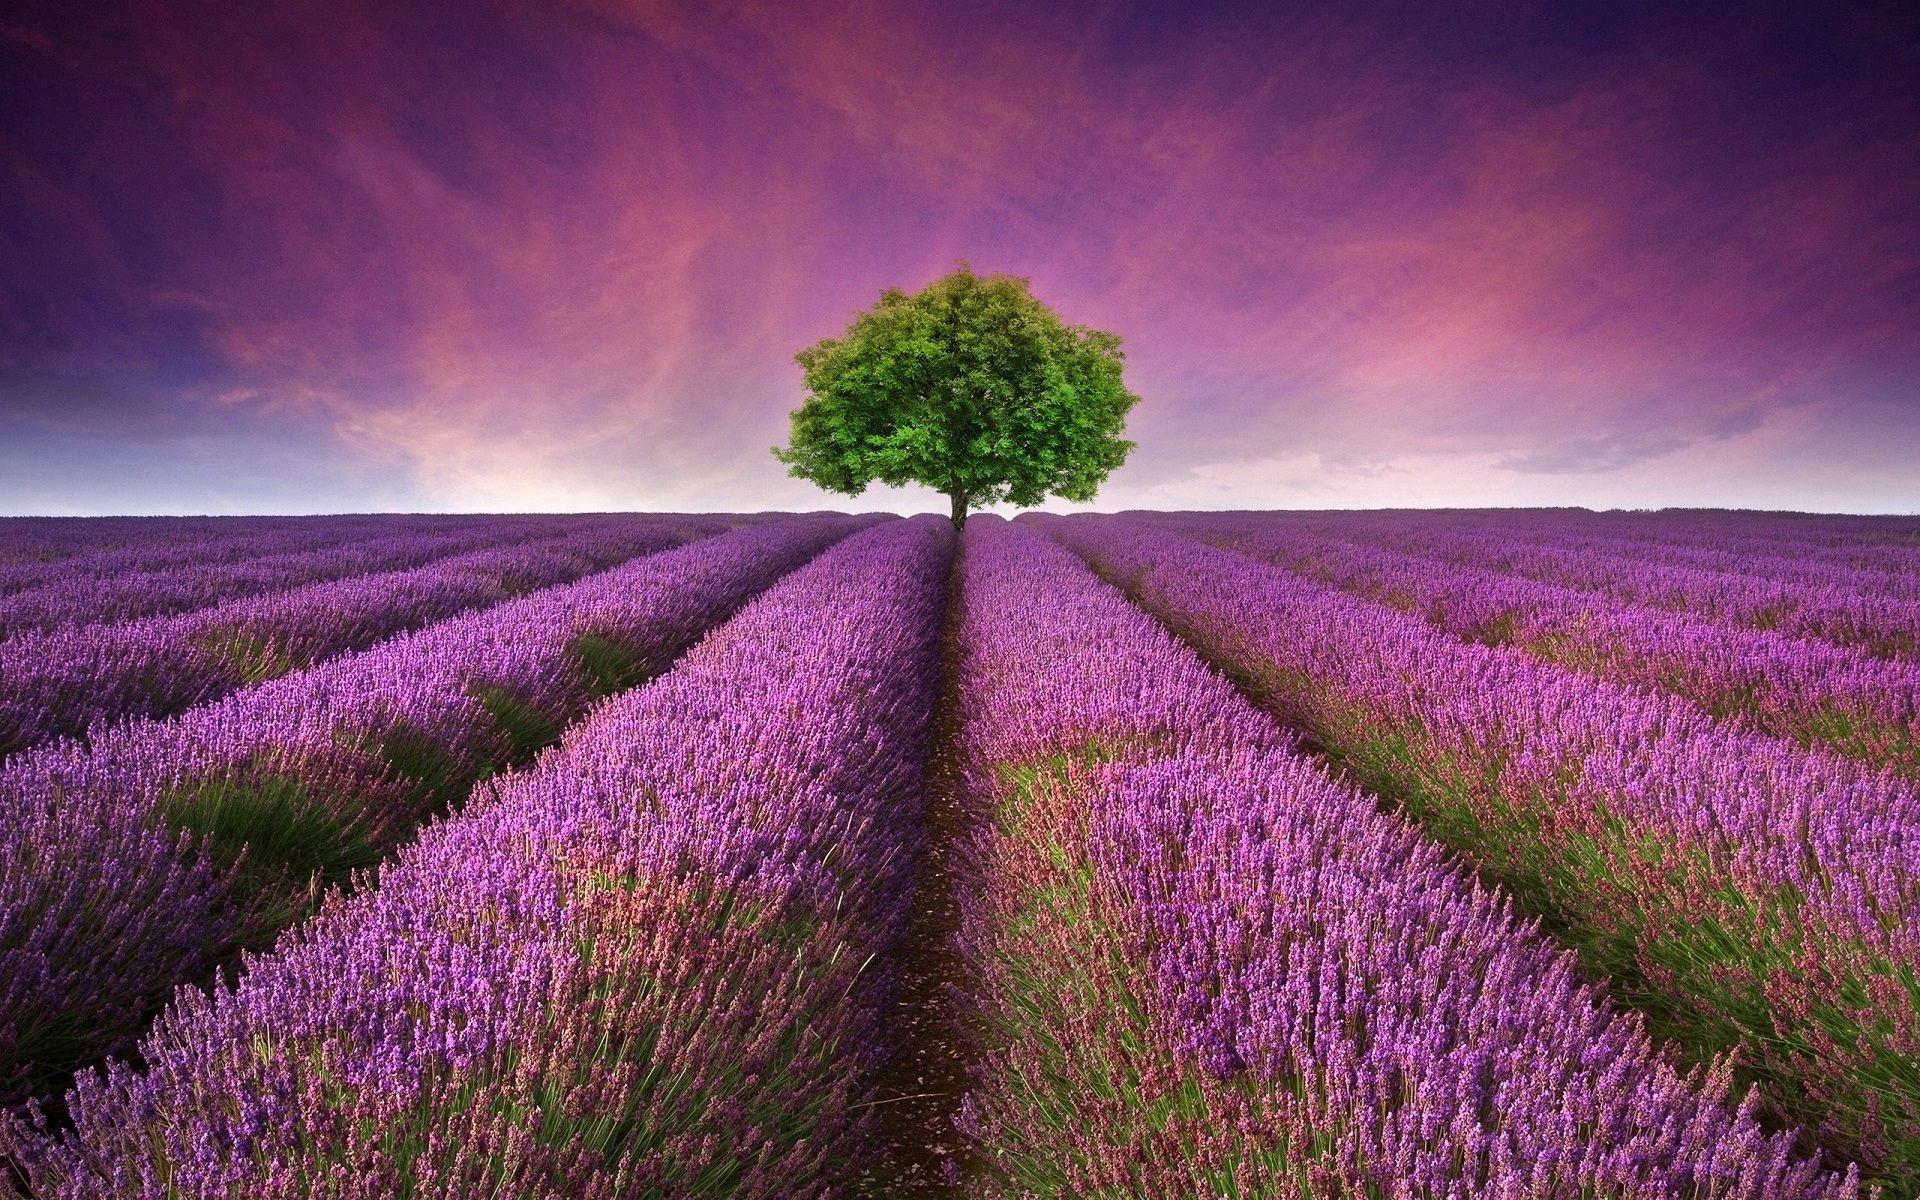 Purple Flowers Farm New Wallpaper Hd Wallpapers Rocks Beautiful Nature Wallpaper Summer Landscape Sunset Landscape